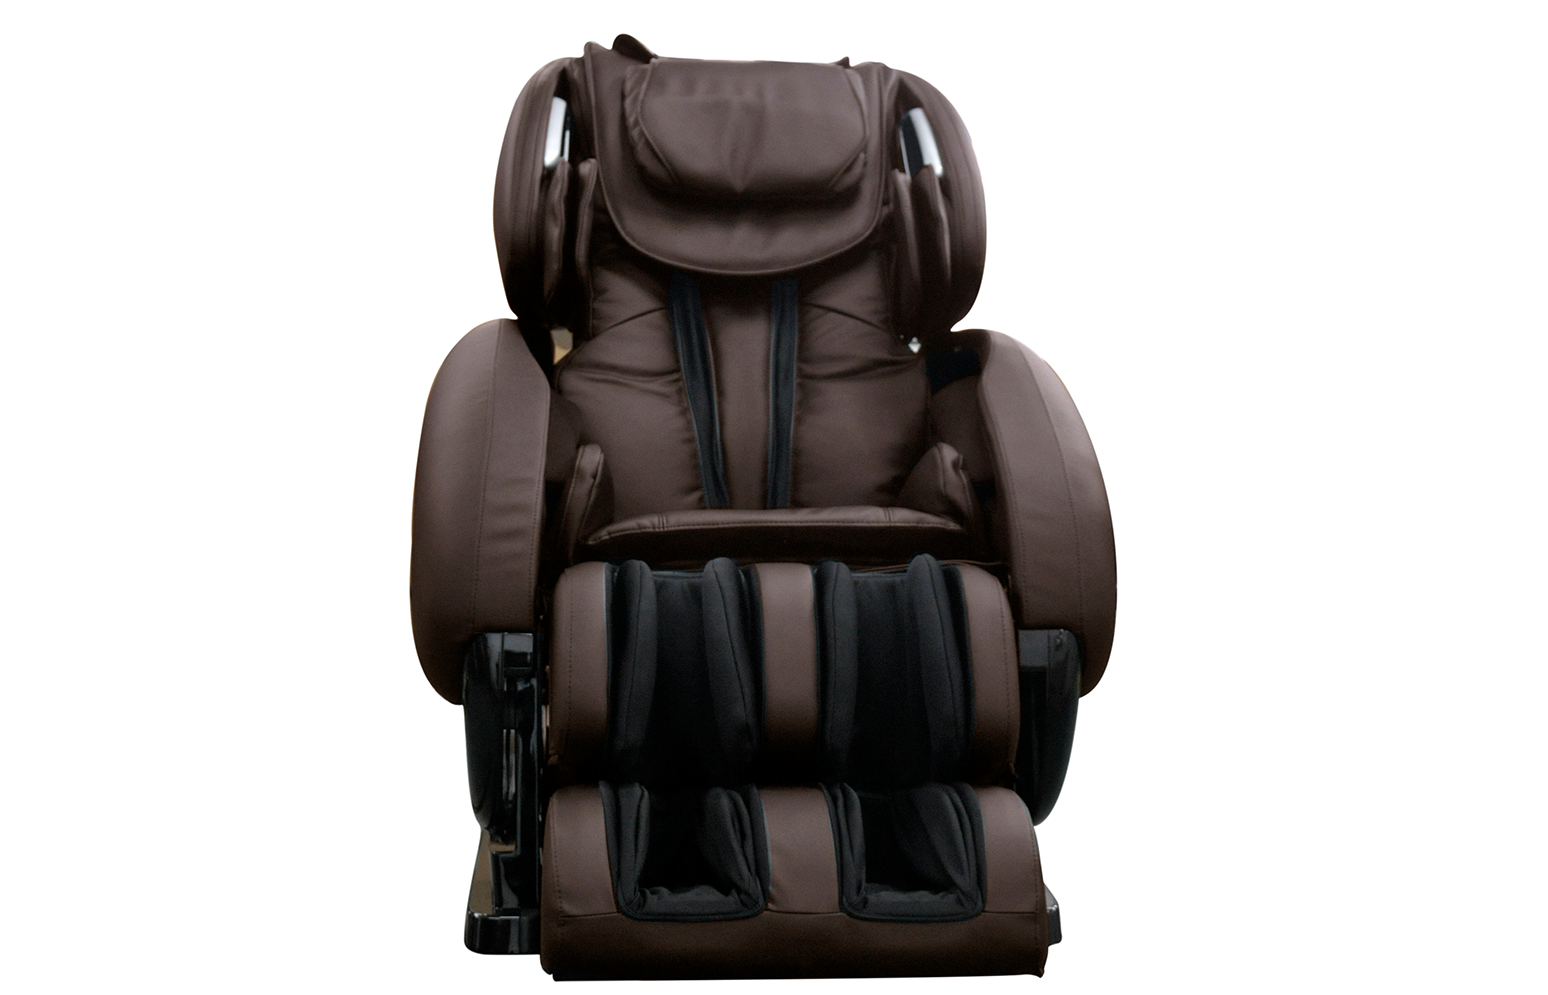 Relax 2 zero 3D massage chair brown